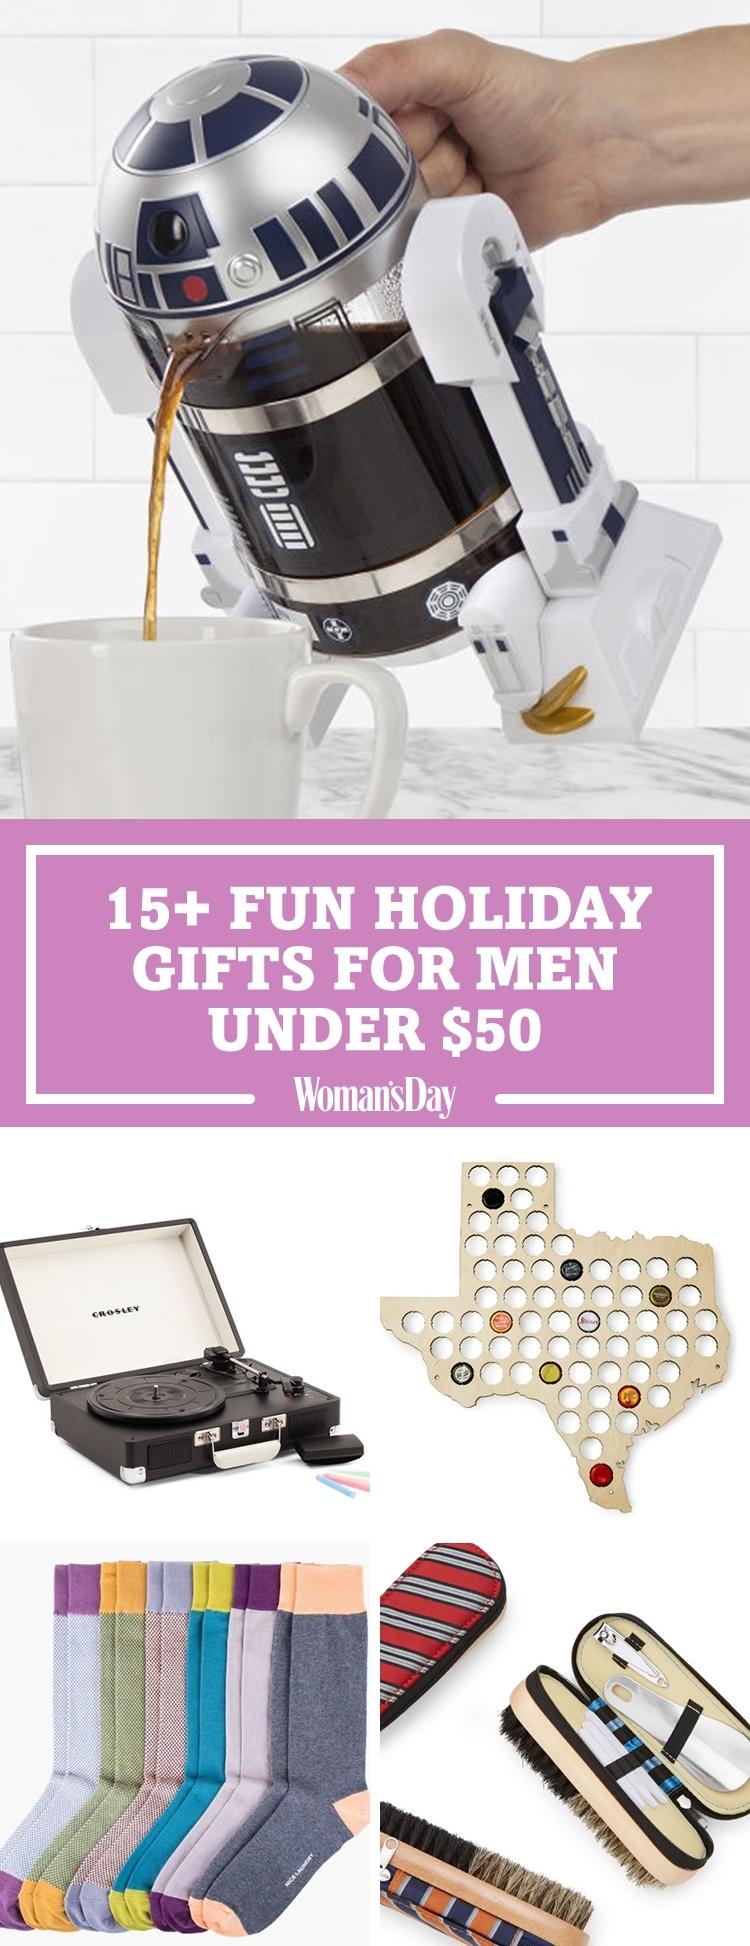 10 Gorgeous Great Christmas Gift Ideas For Men %name 2021